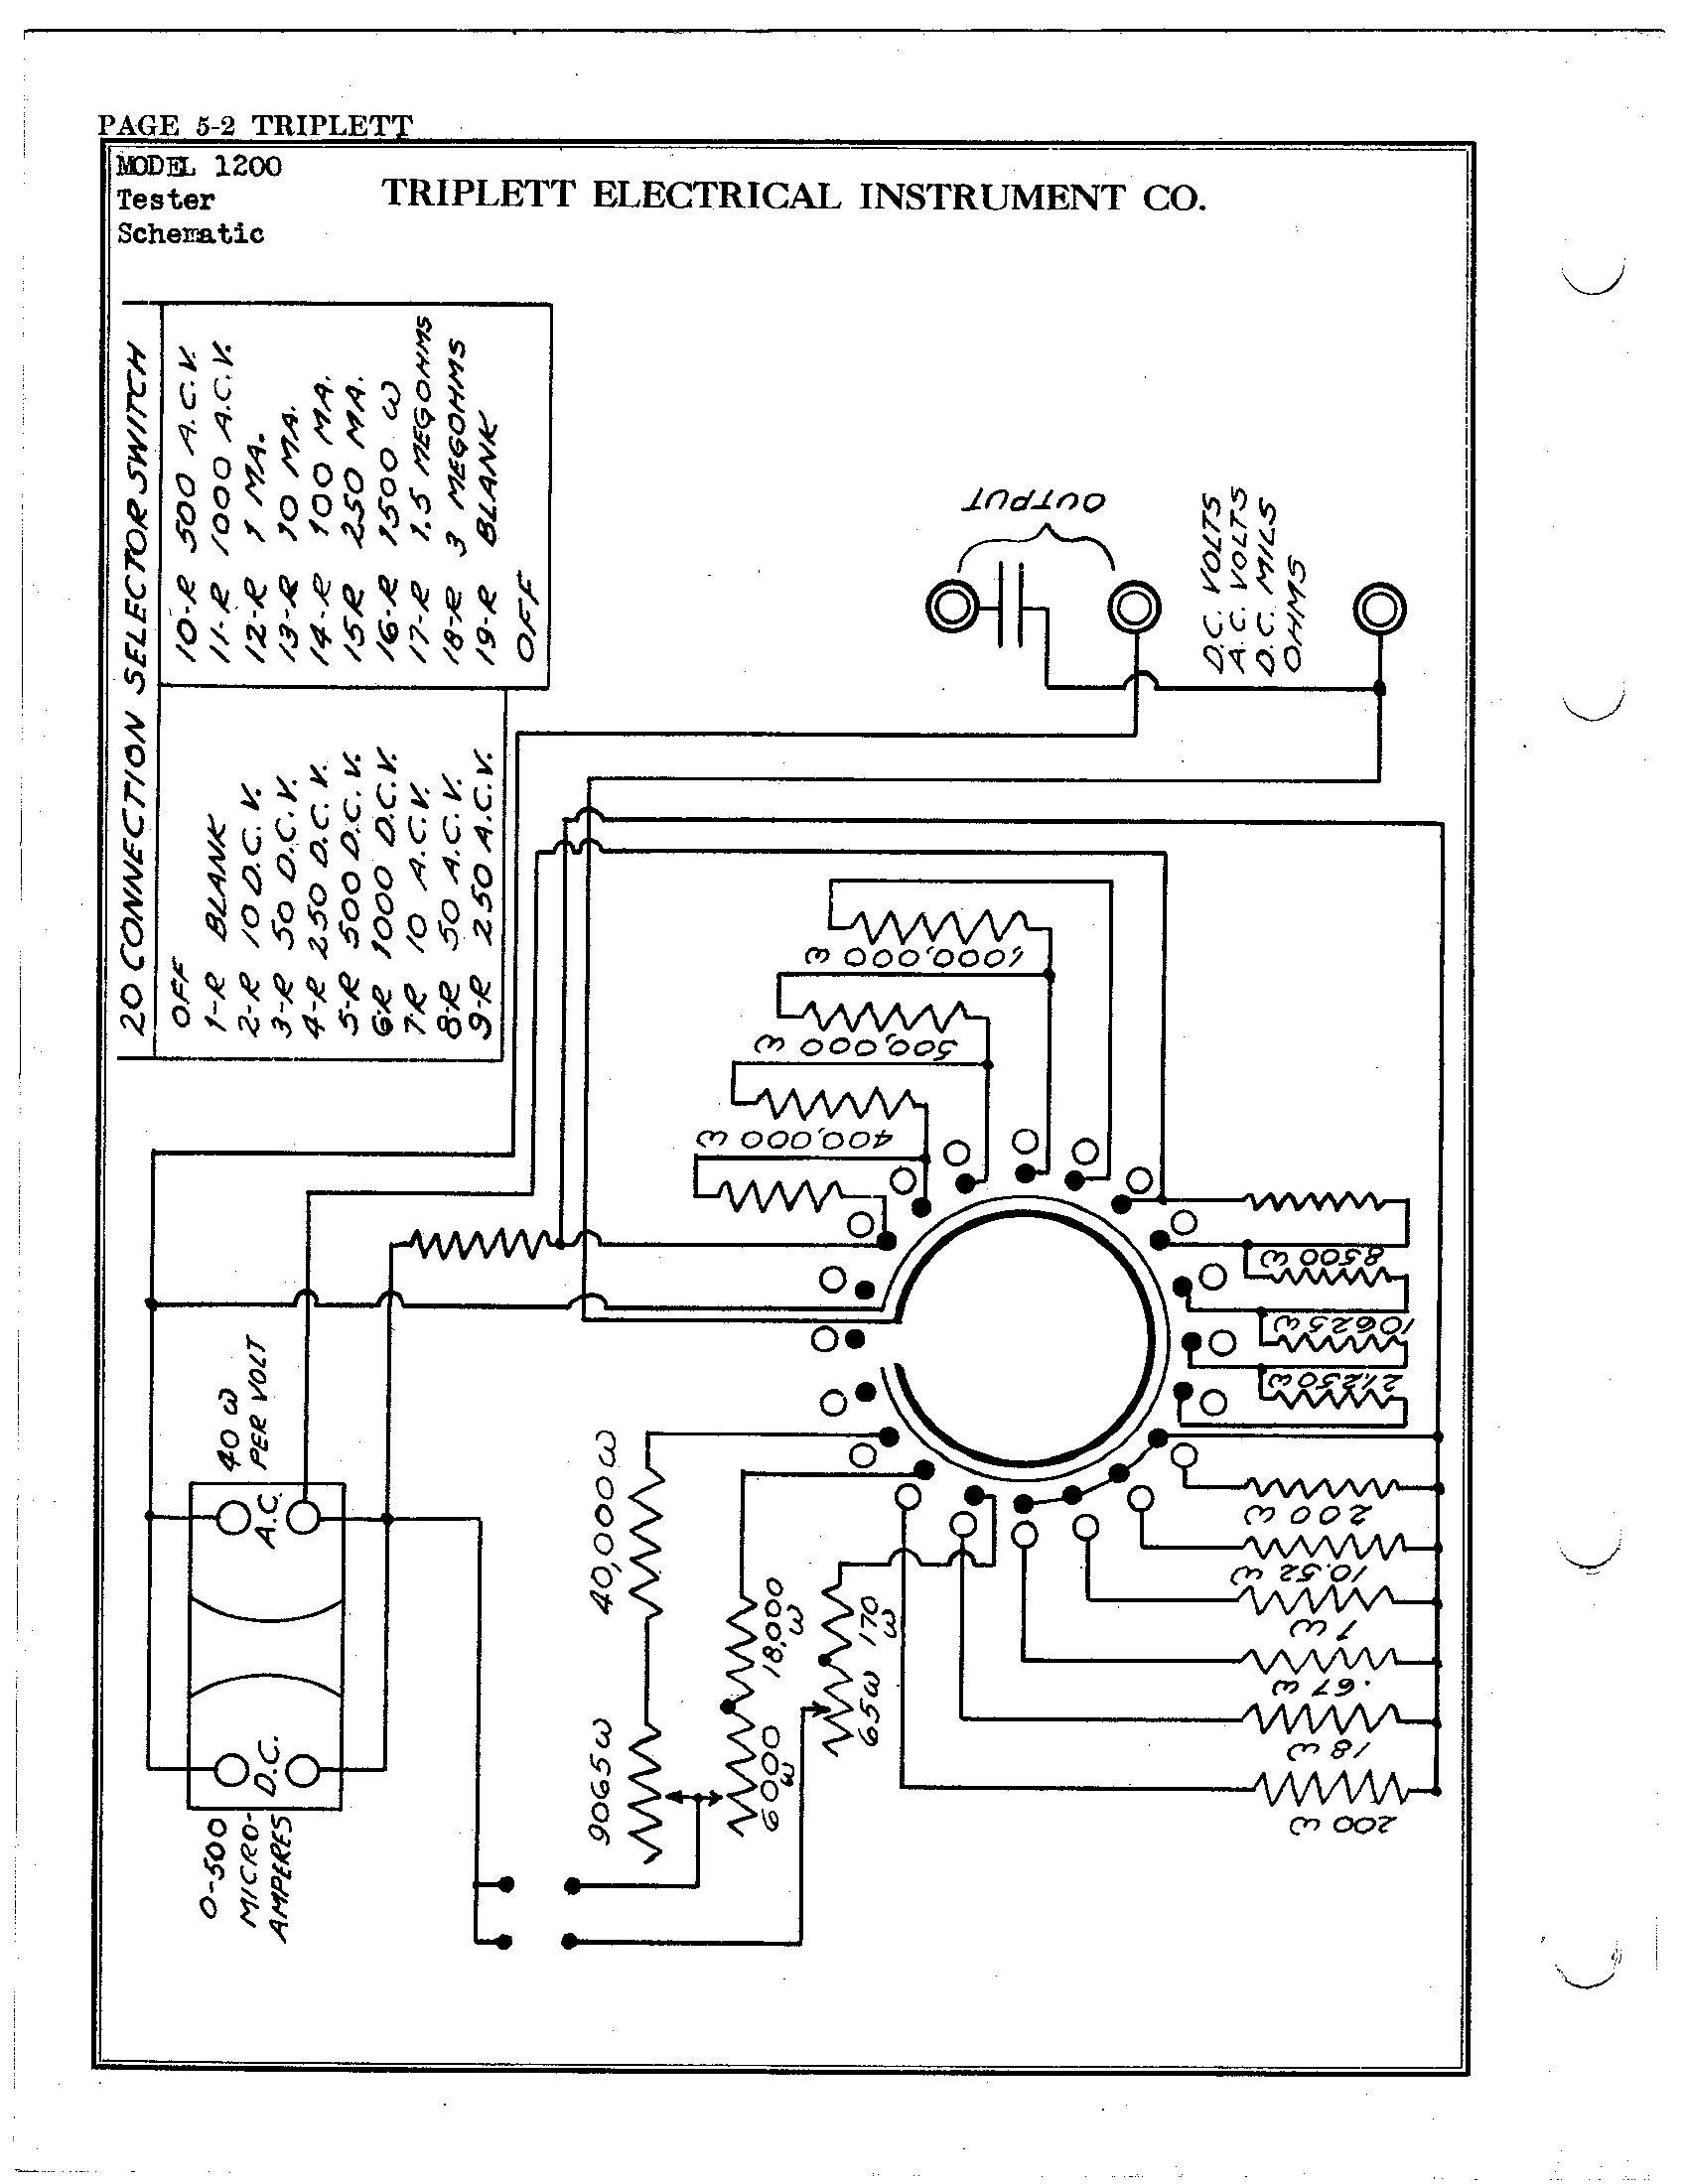 Triplett Electrical Instrument Co